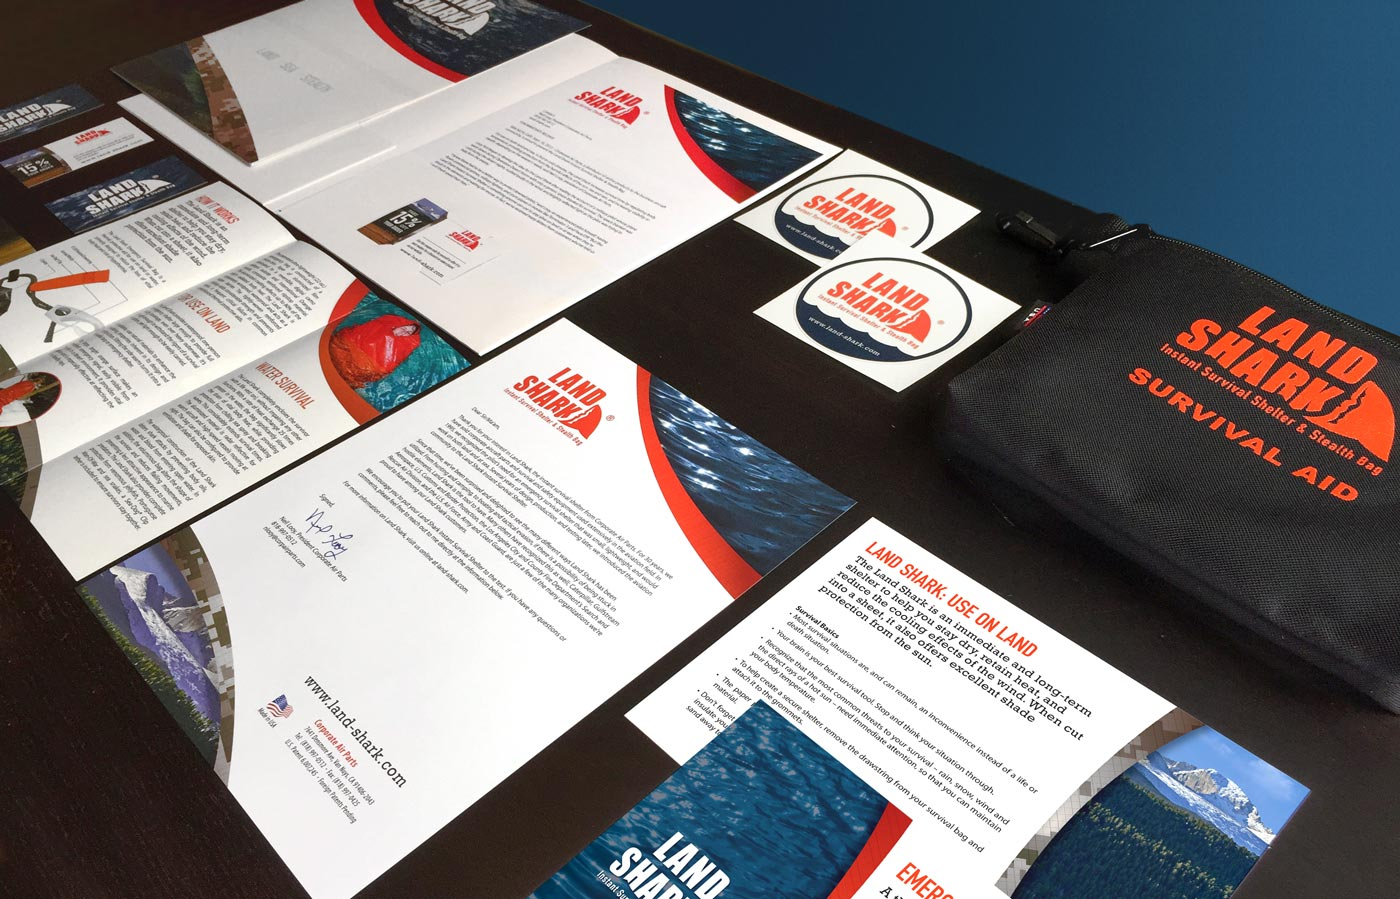 Press Kits & the Art of Self-Promotion